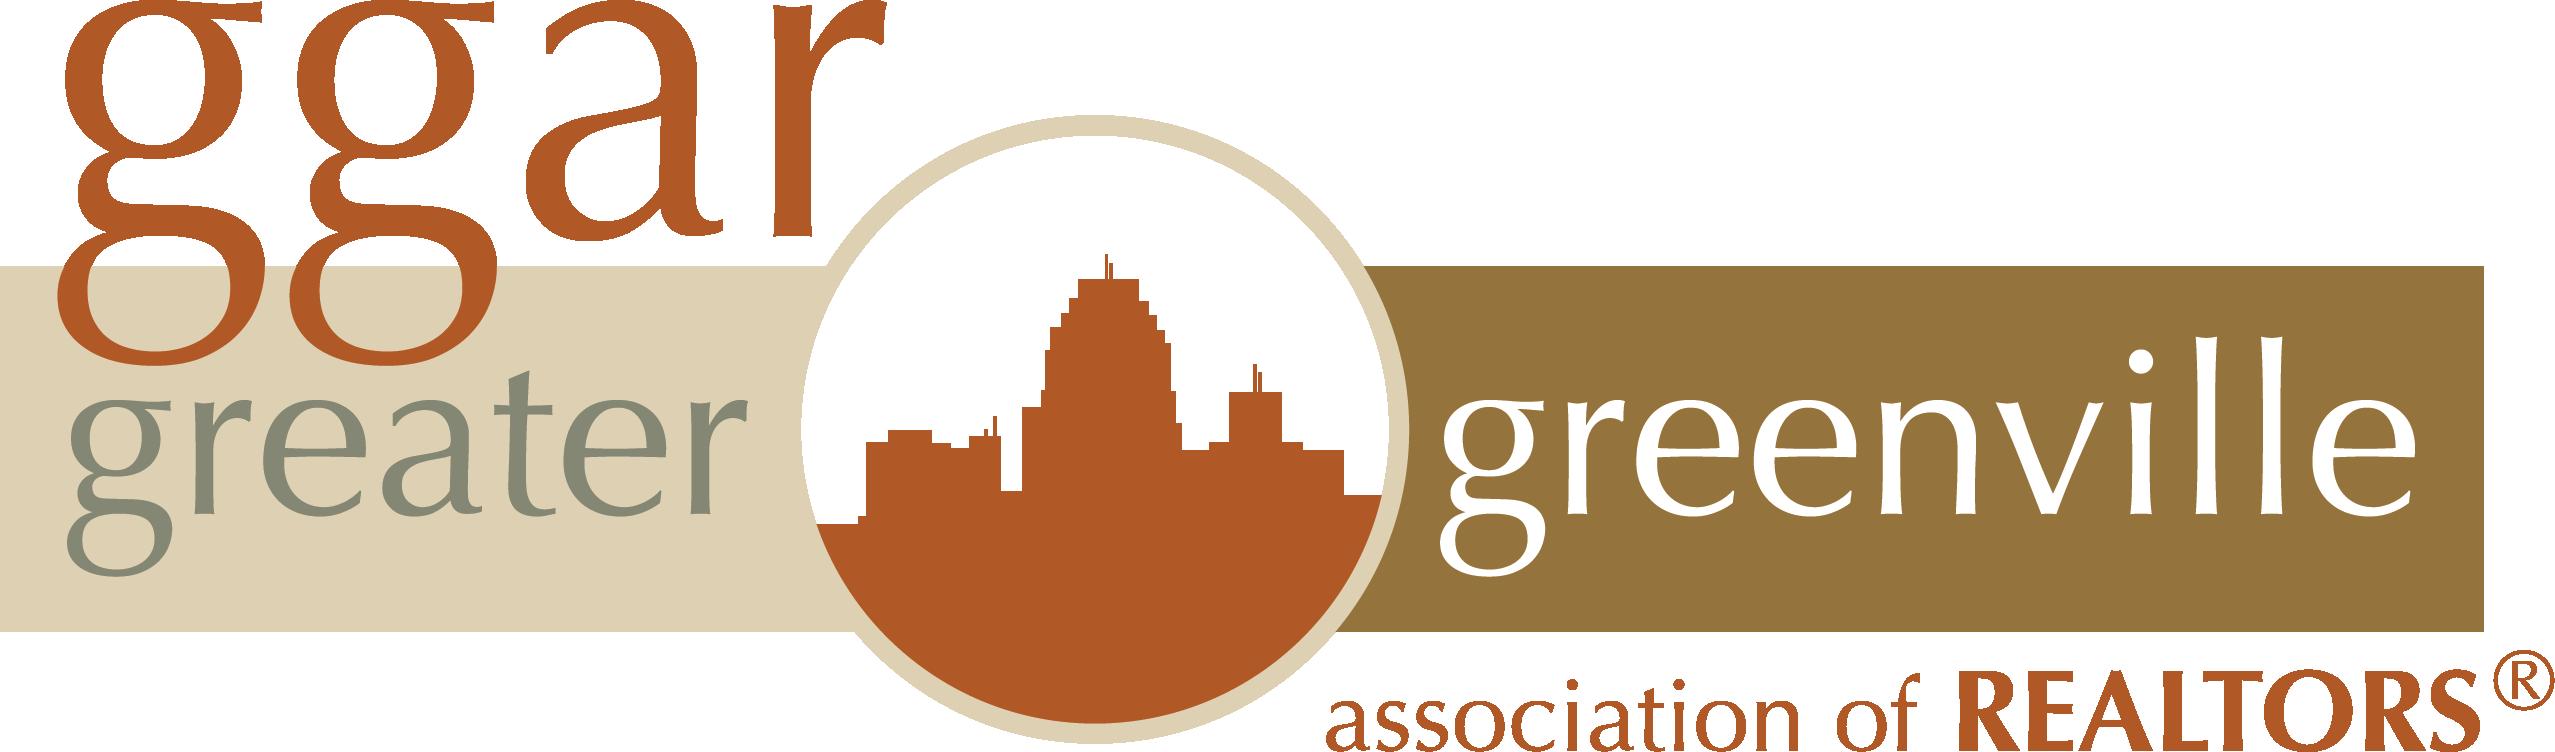 The Greater Greenville Association of REALTORS®